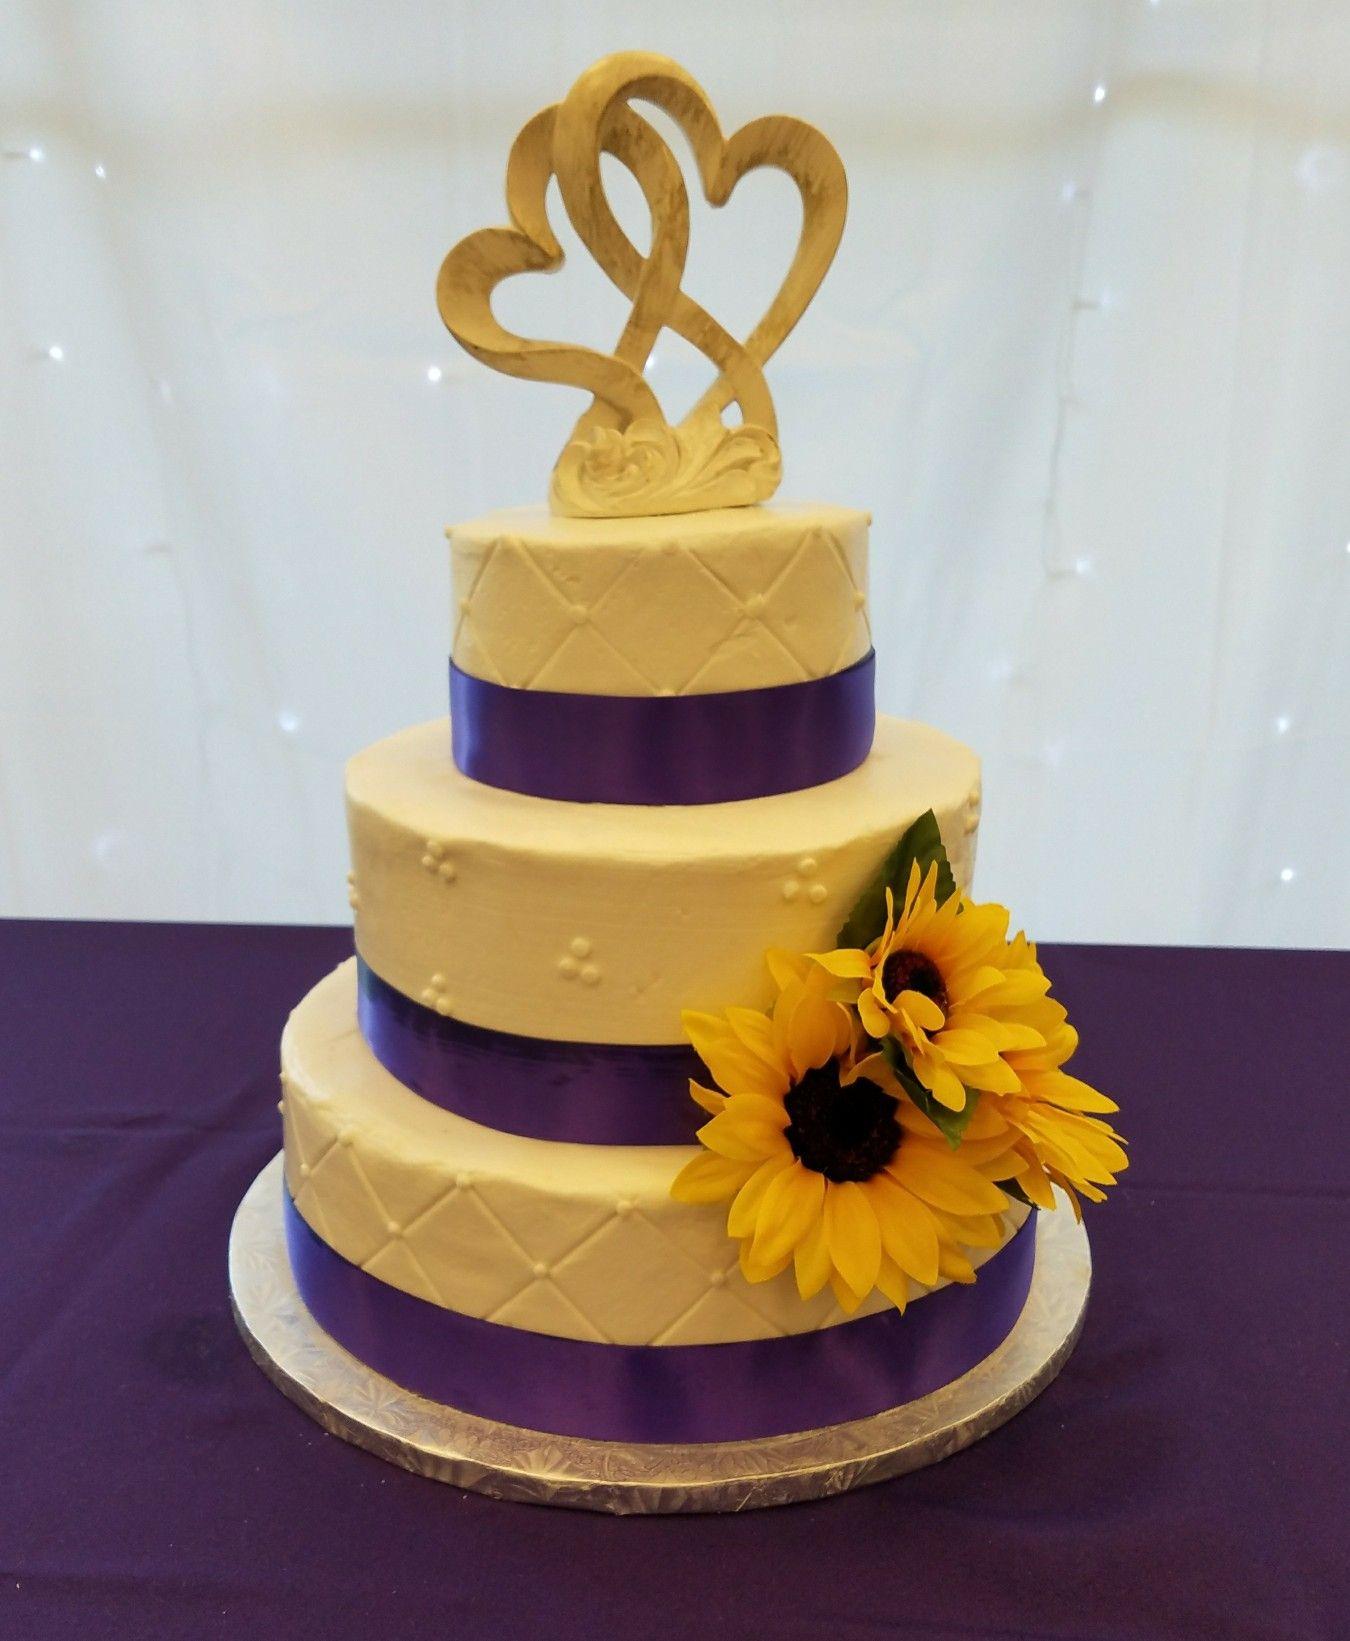 Purple sunflower wedding cake | Wedding cakes in 2018 | Pinterest ...